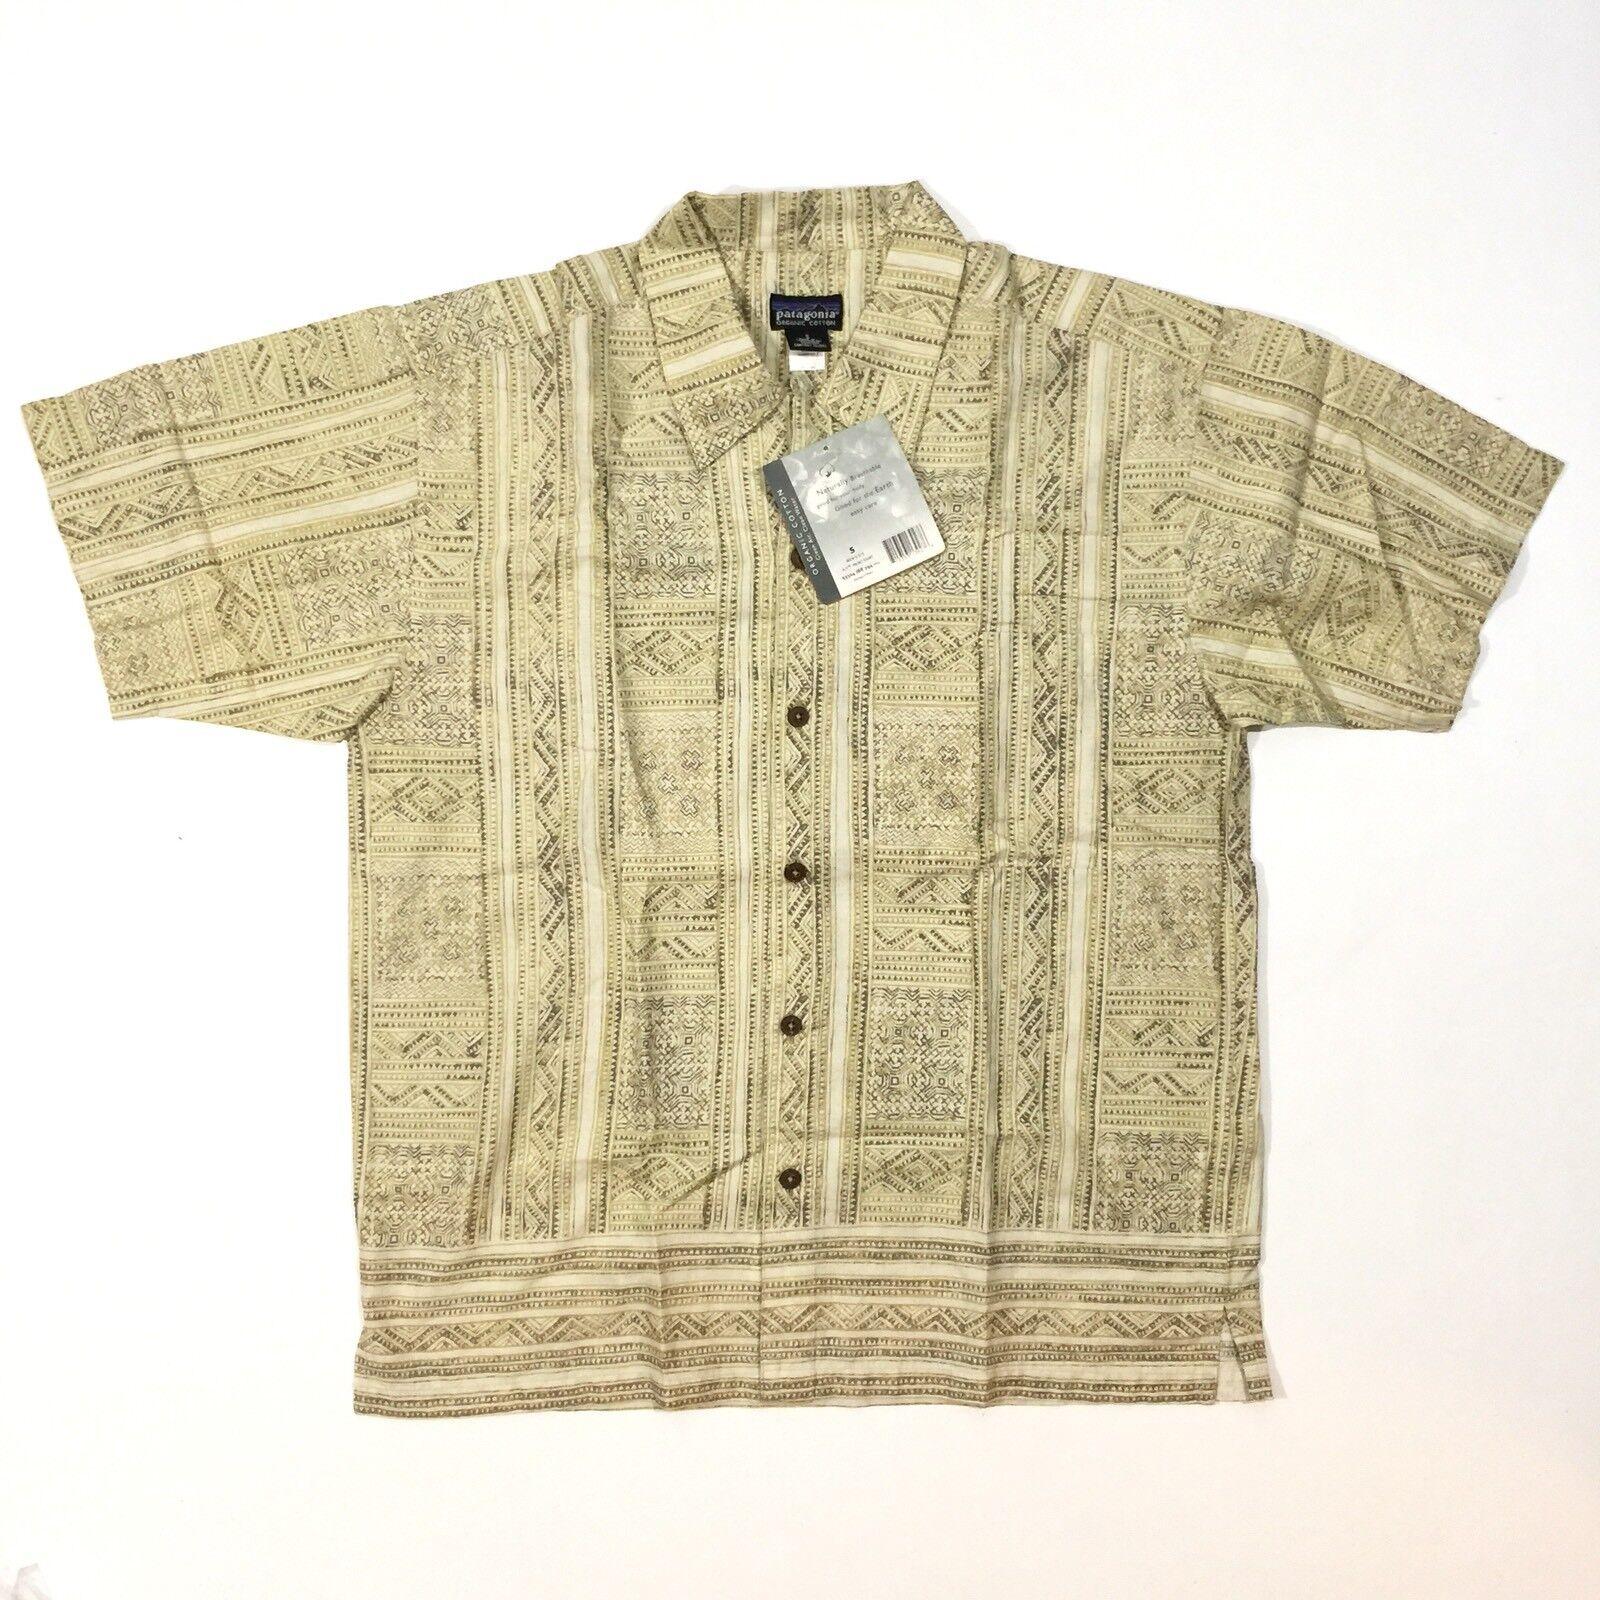 Patagonia Organic Cotton Button Down Shirt Size Small BNWT New  B5